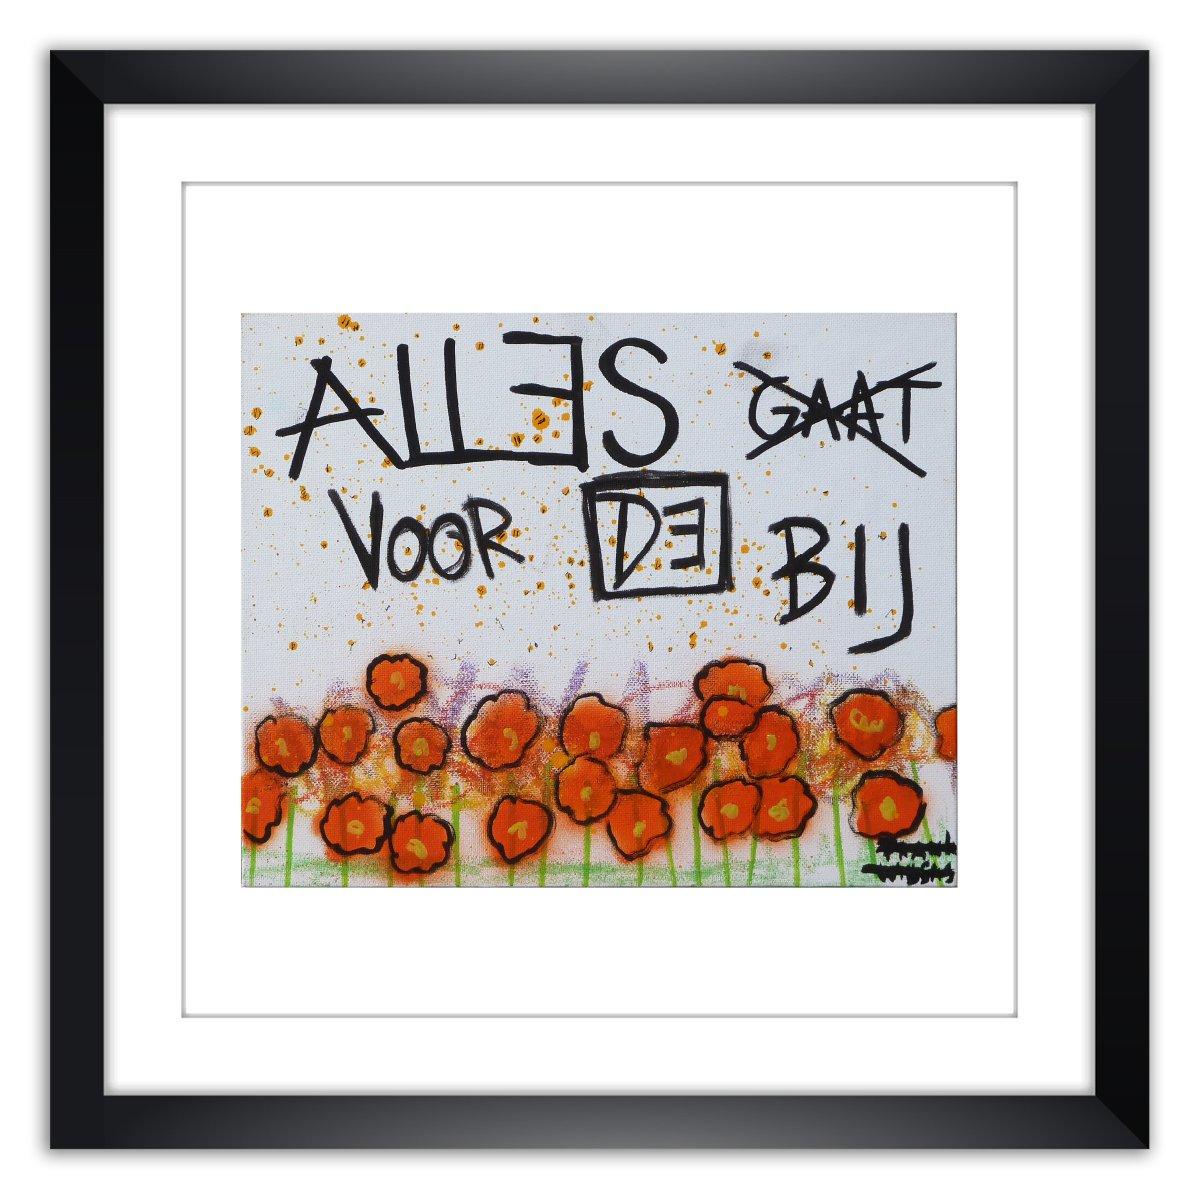 Limited prints - ALLES GAAT VOORBIJ framed - Frank Willems